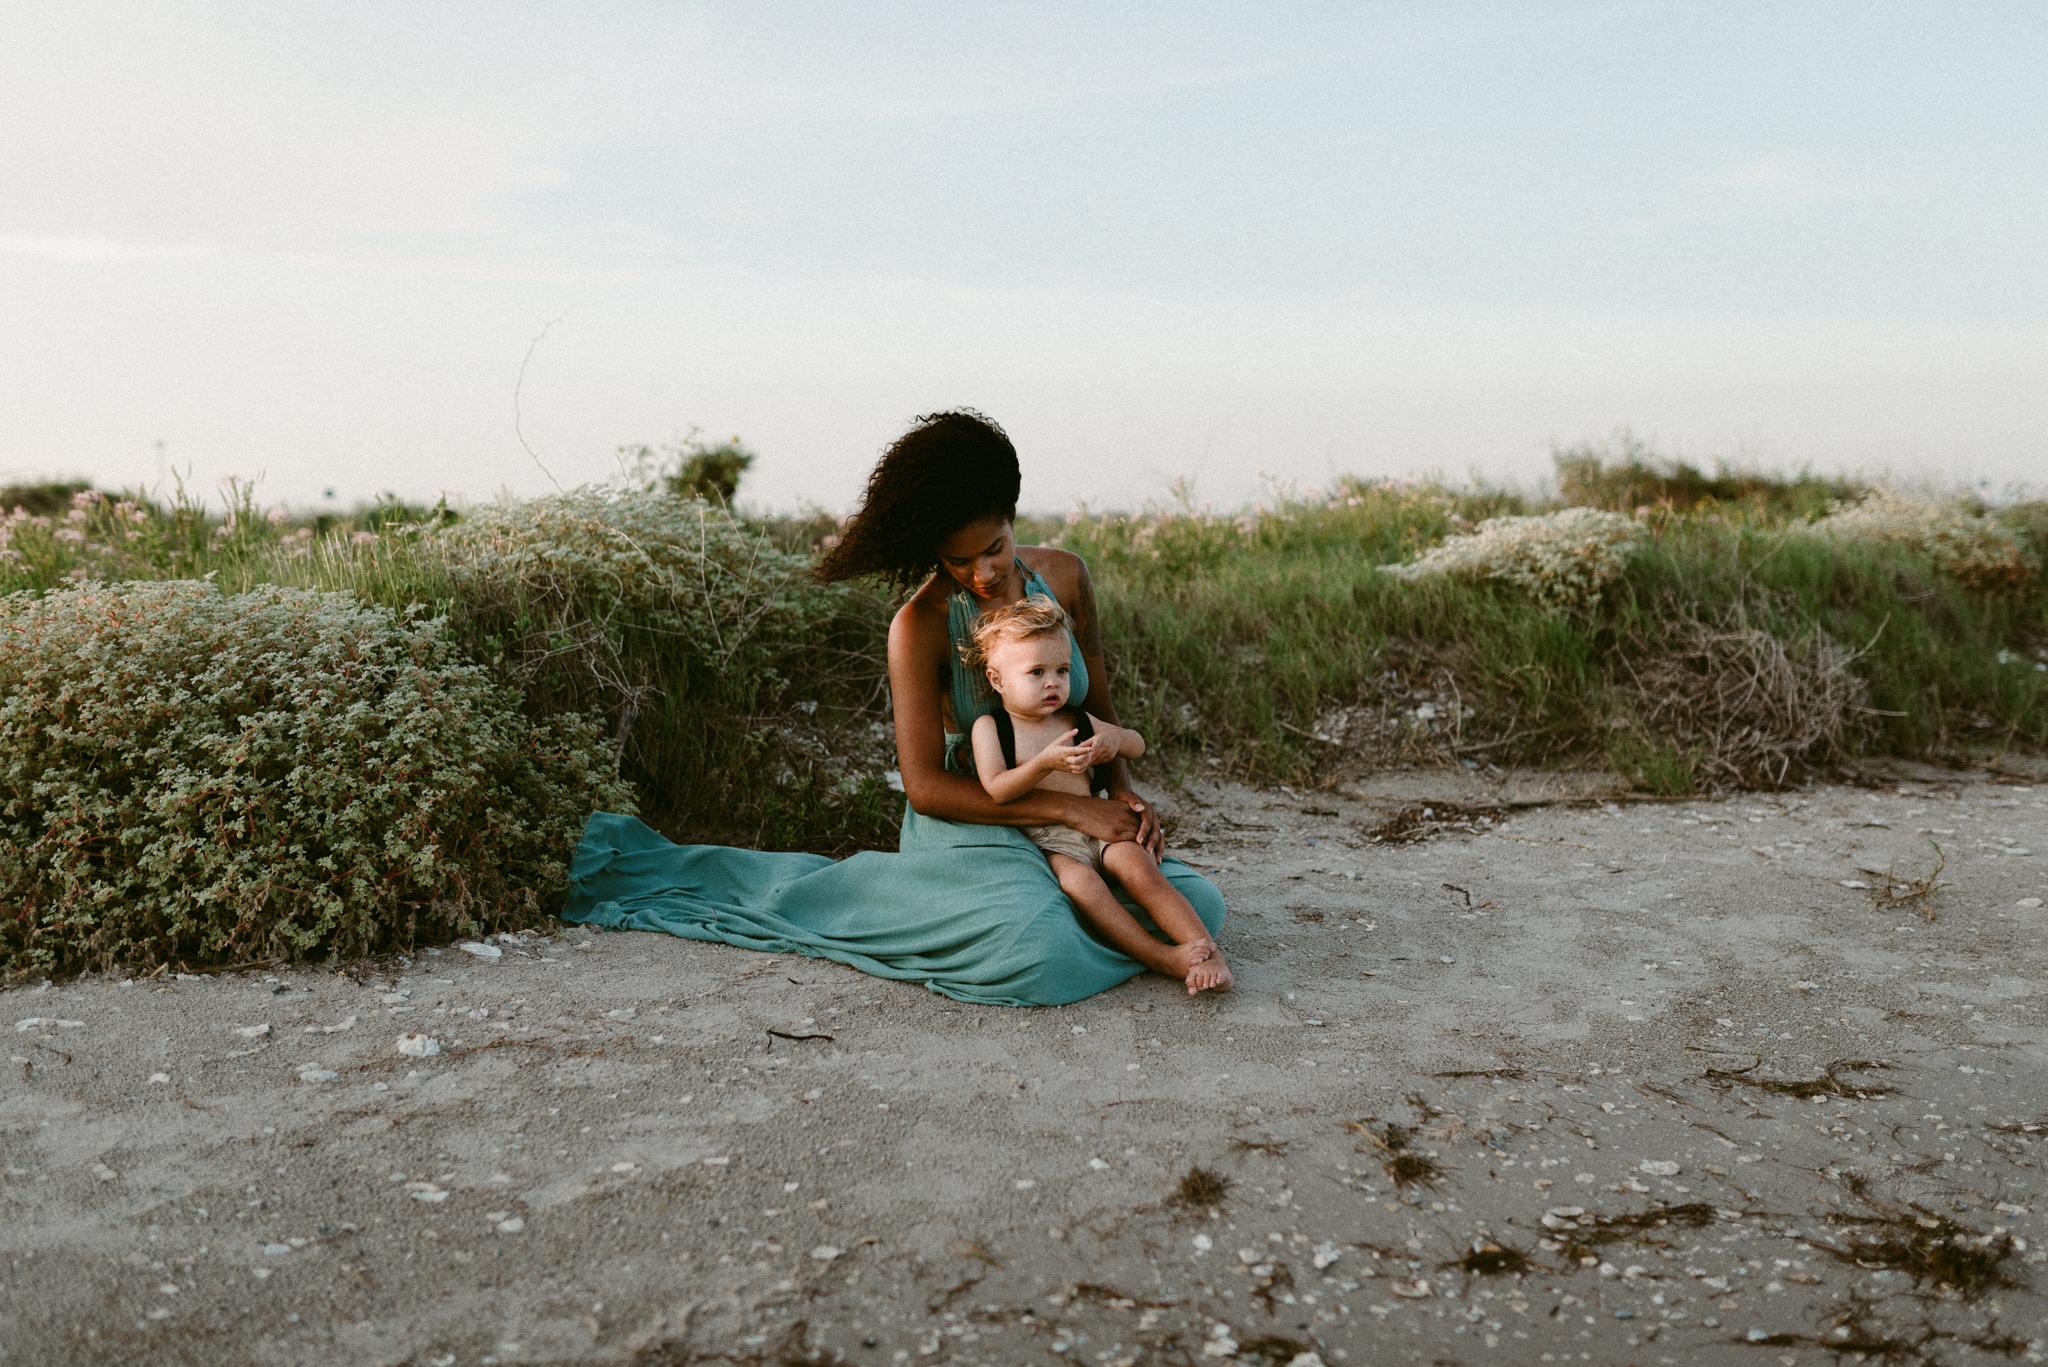 kerlyn-van-gelder-photography-corpus-christi-photographer-sunset-family-session-corpus-christi-bay